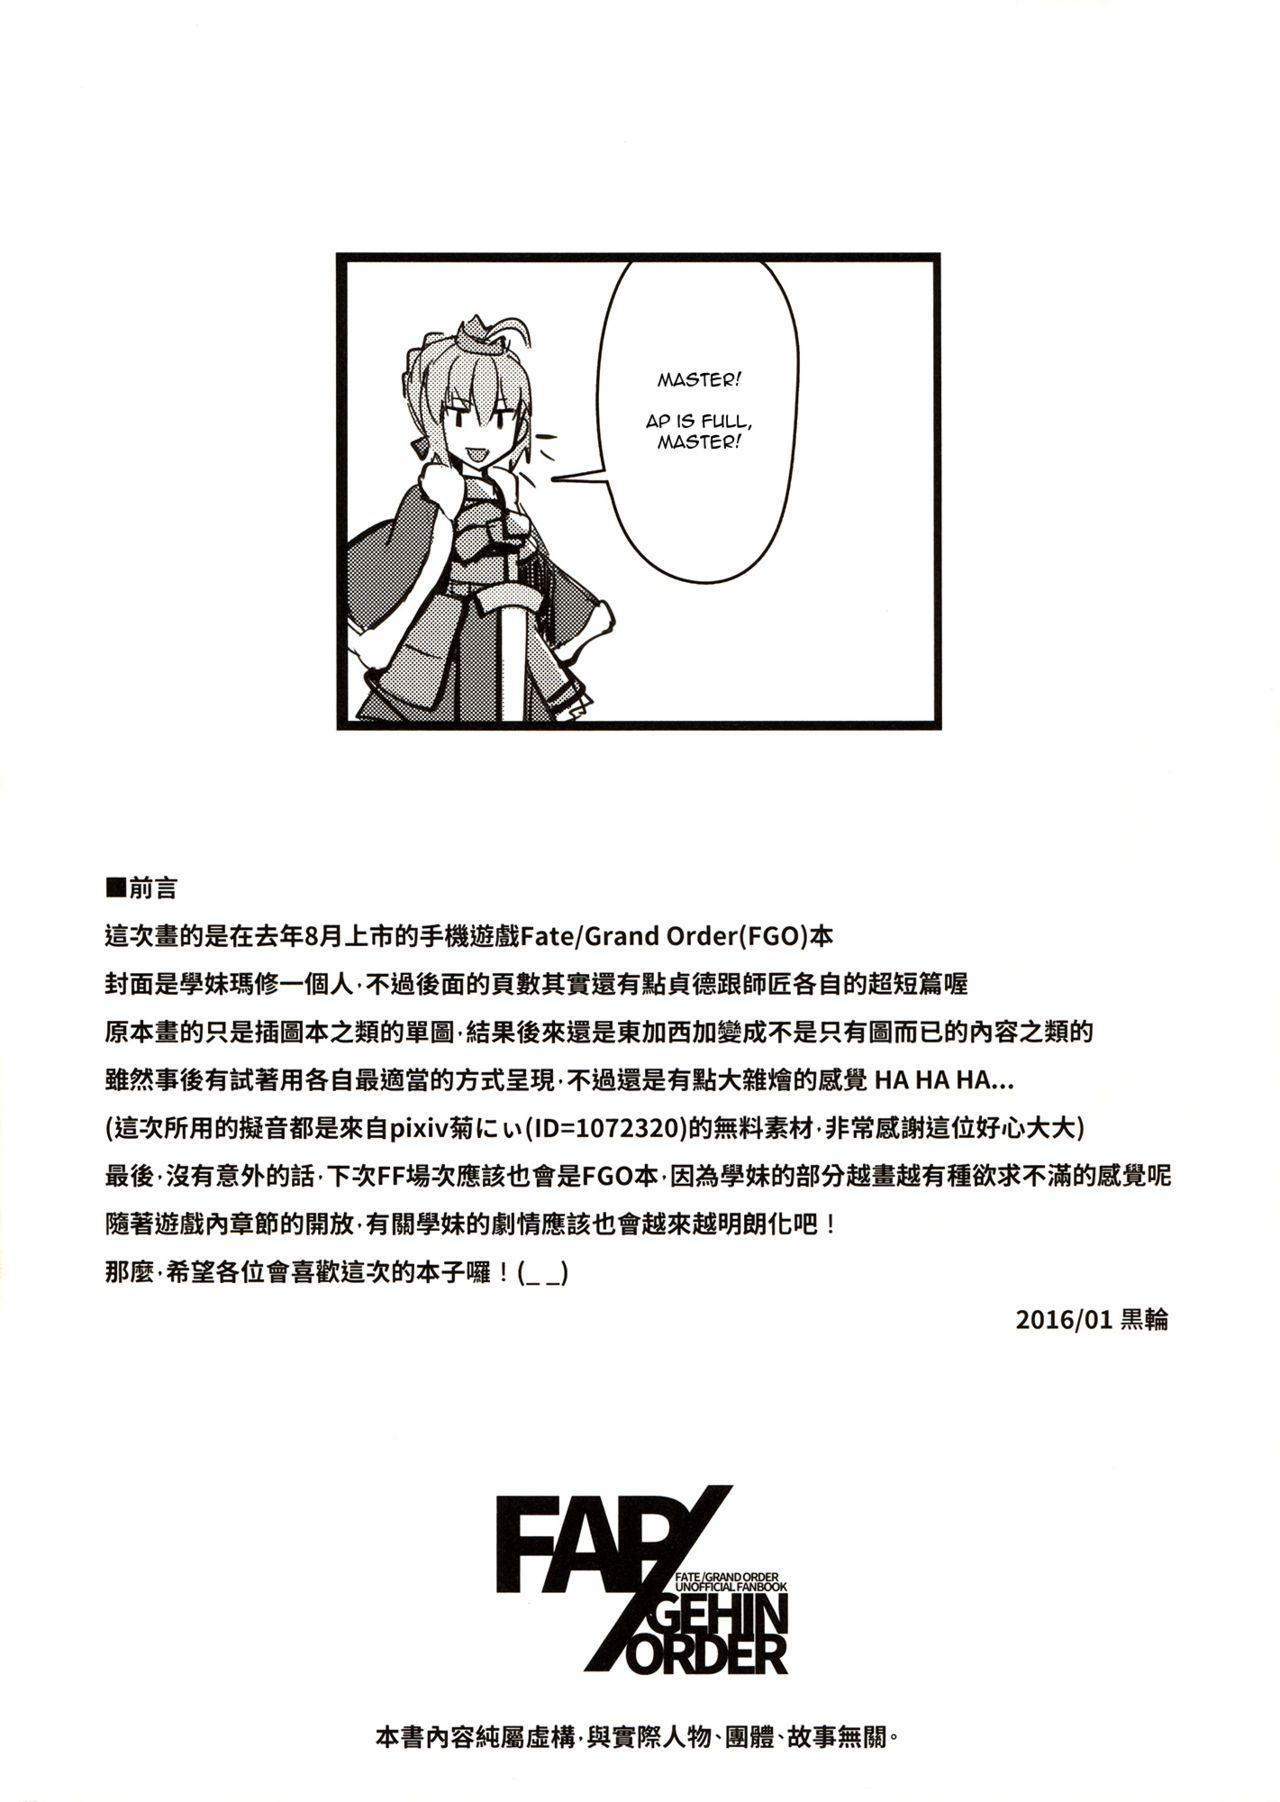 FAP/GEHIN ORDER 3